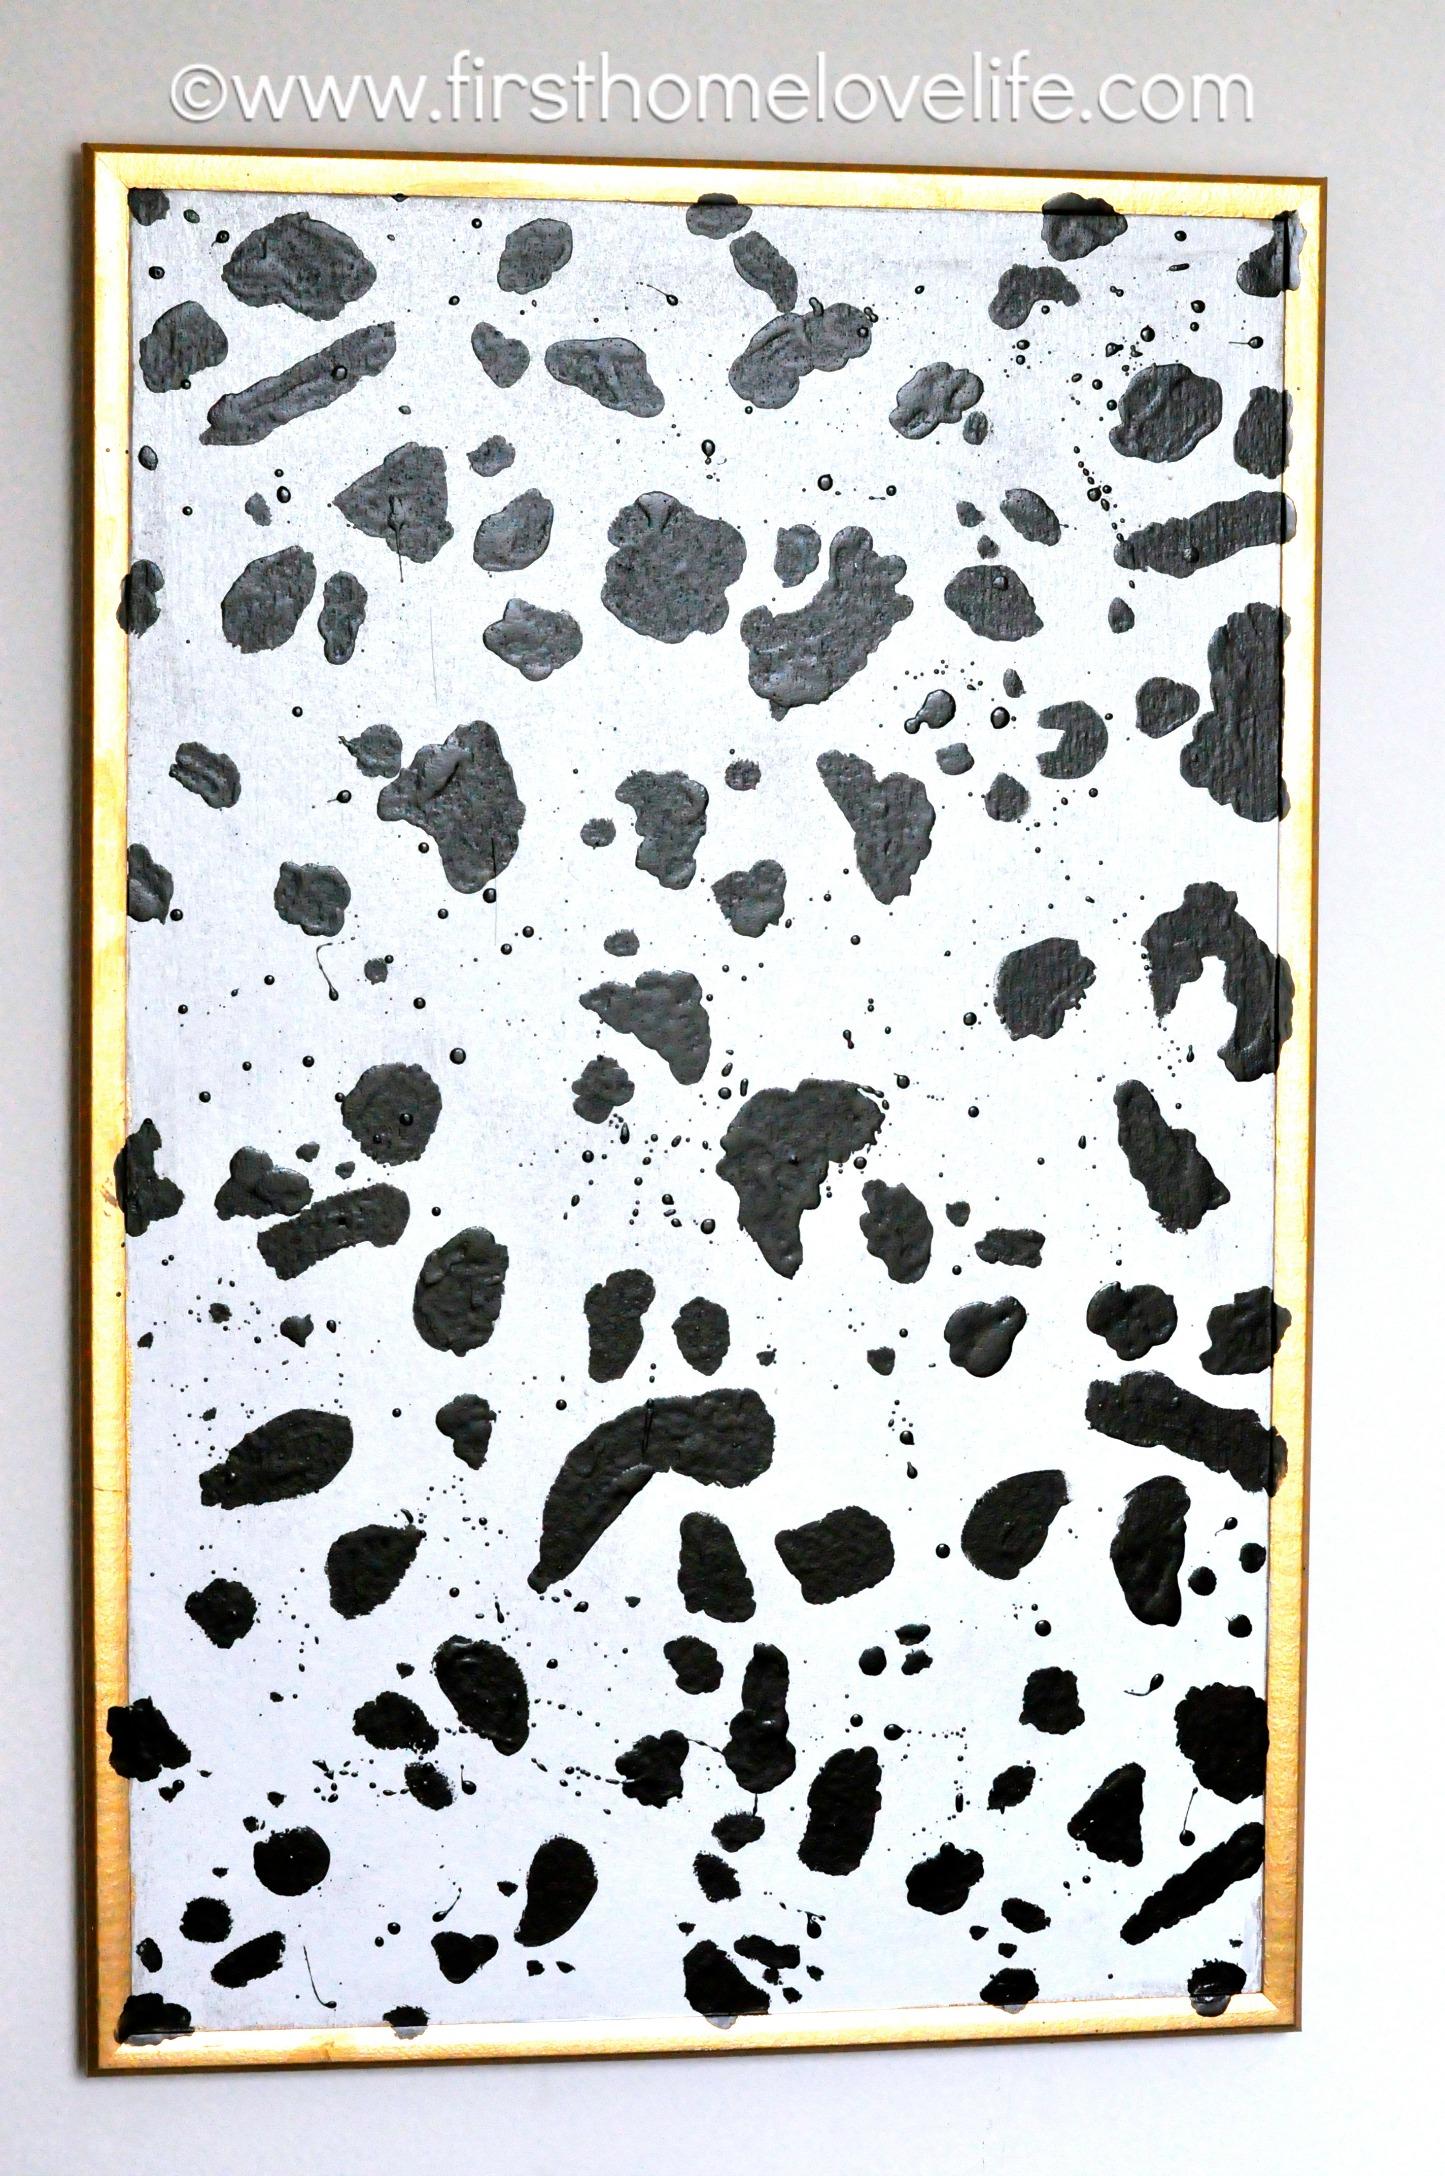 Dalmatian Print Bulletin Board First Home Love Life